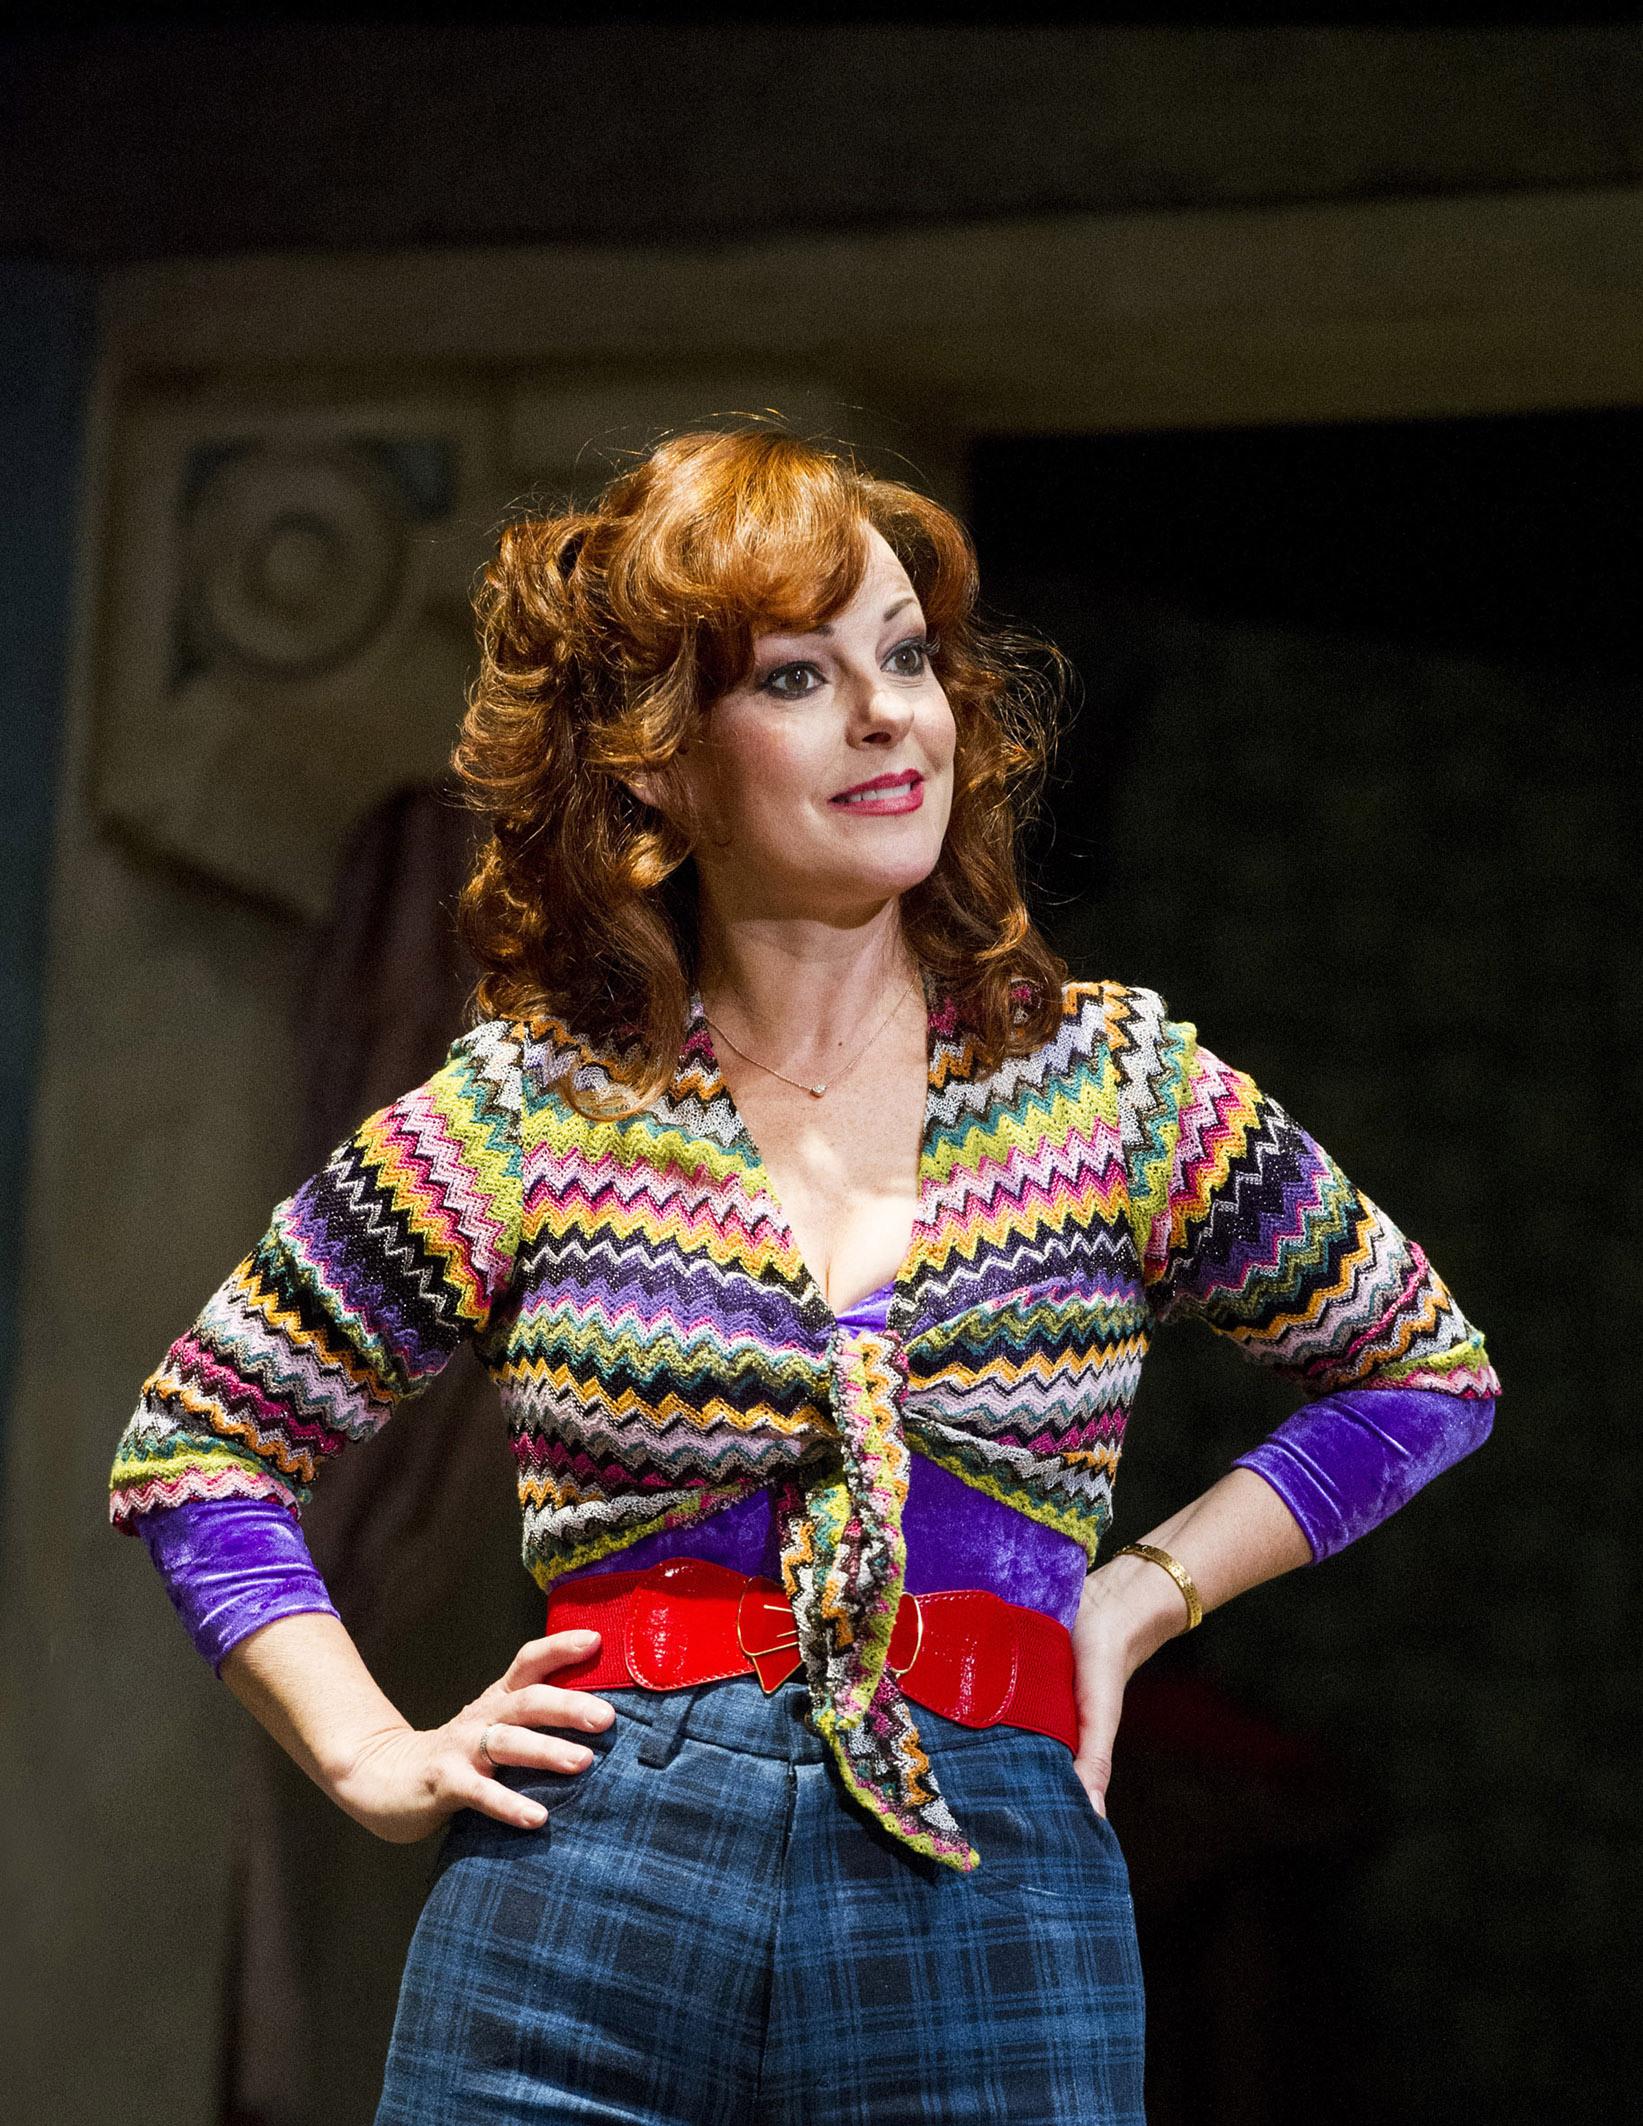 Billy Elliot - Il Musical: Ruthie Hensall in una scena del musical